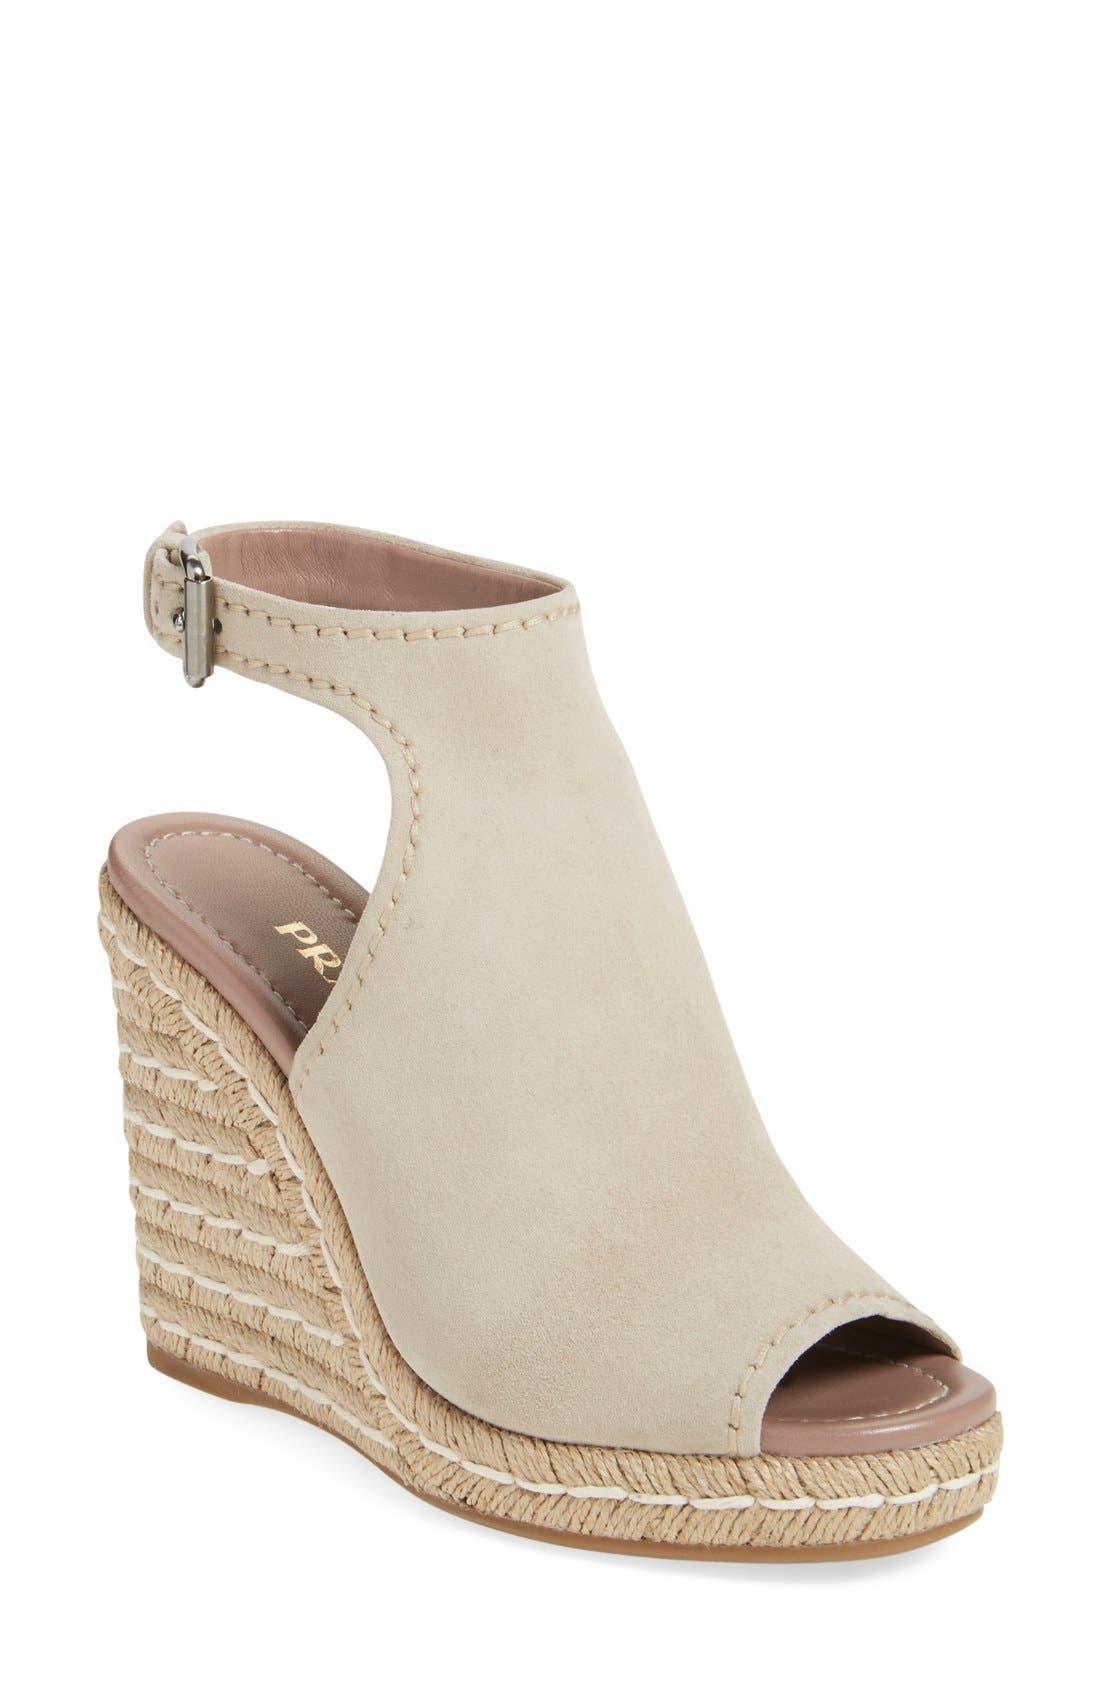 Ankle Strap Espadrille Wedge Sandal,                         Main,                         color, 250